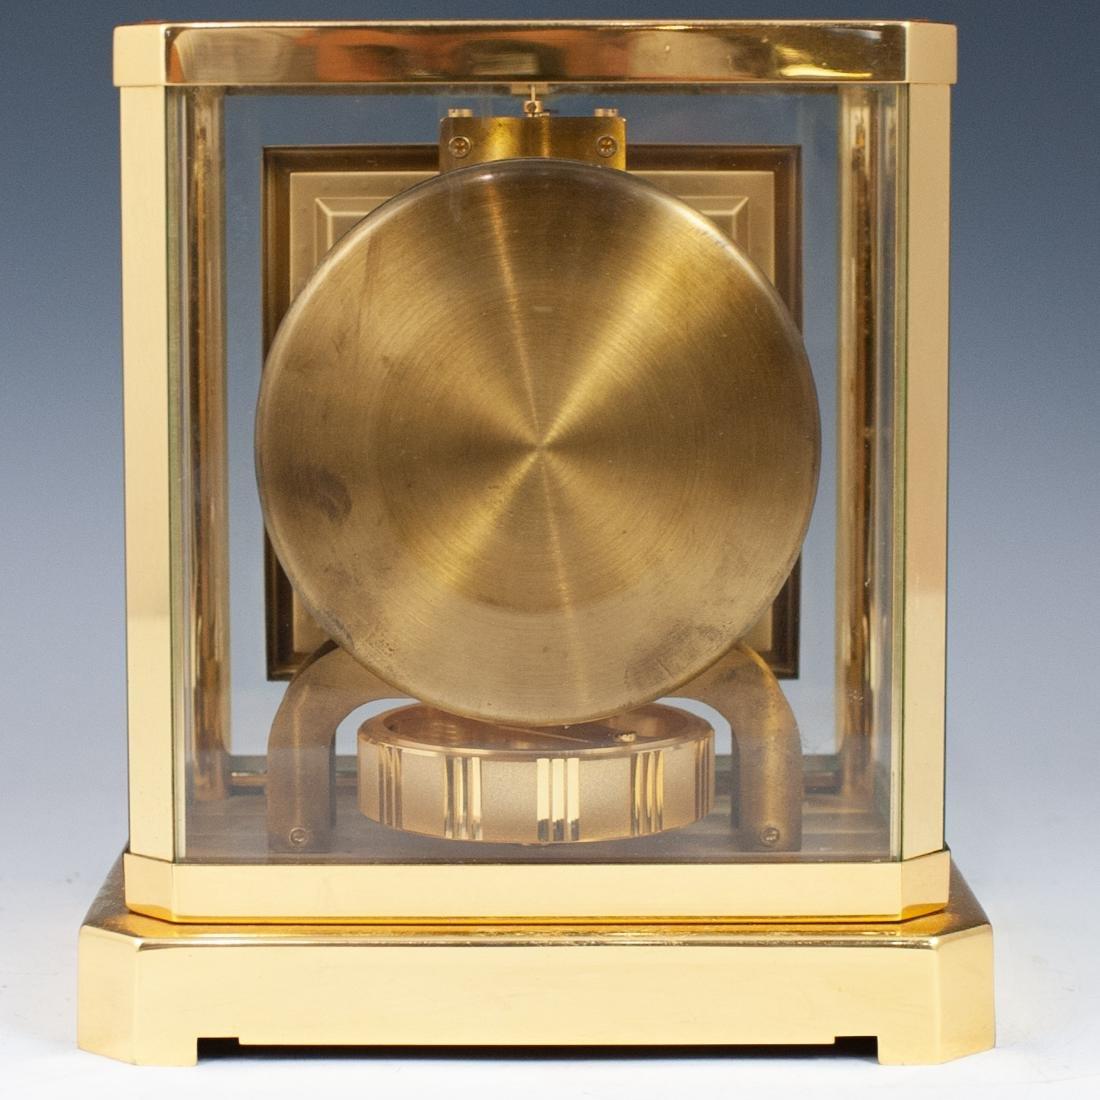 Lecoultre Atmos Perpetual Motion Clock - 6